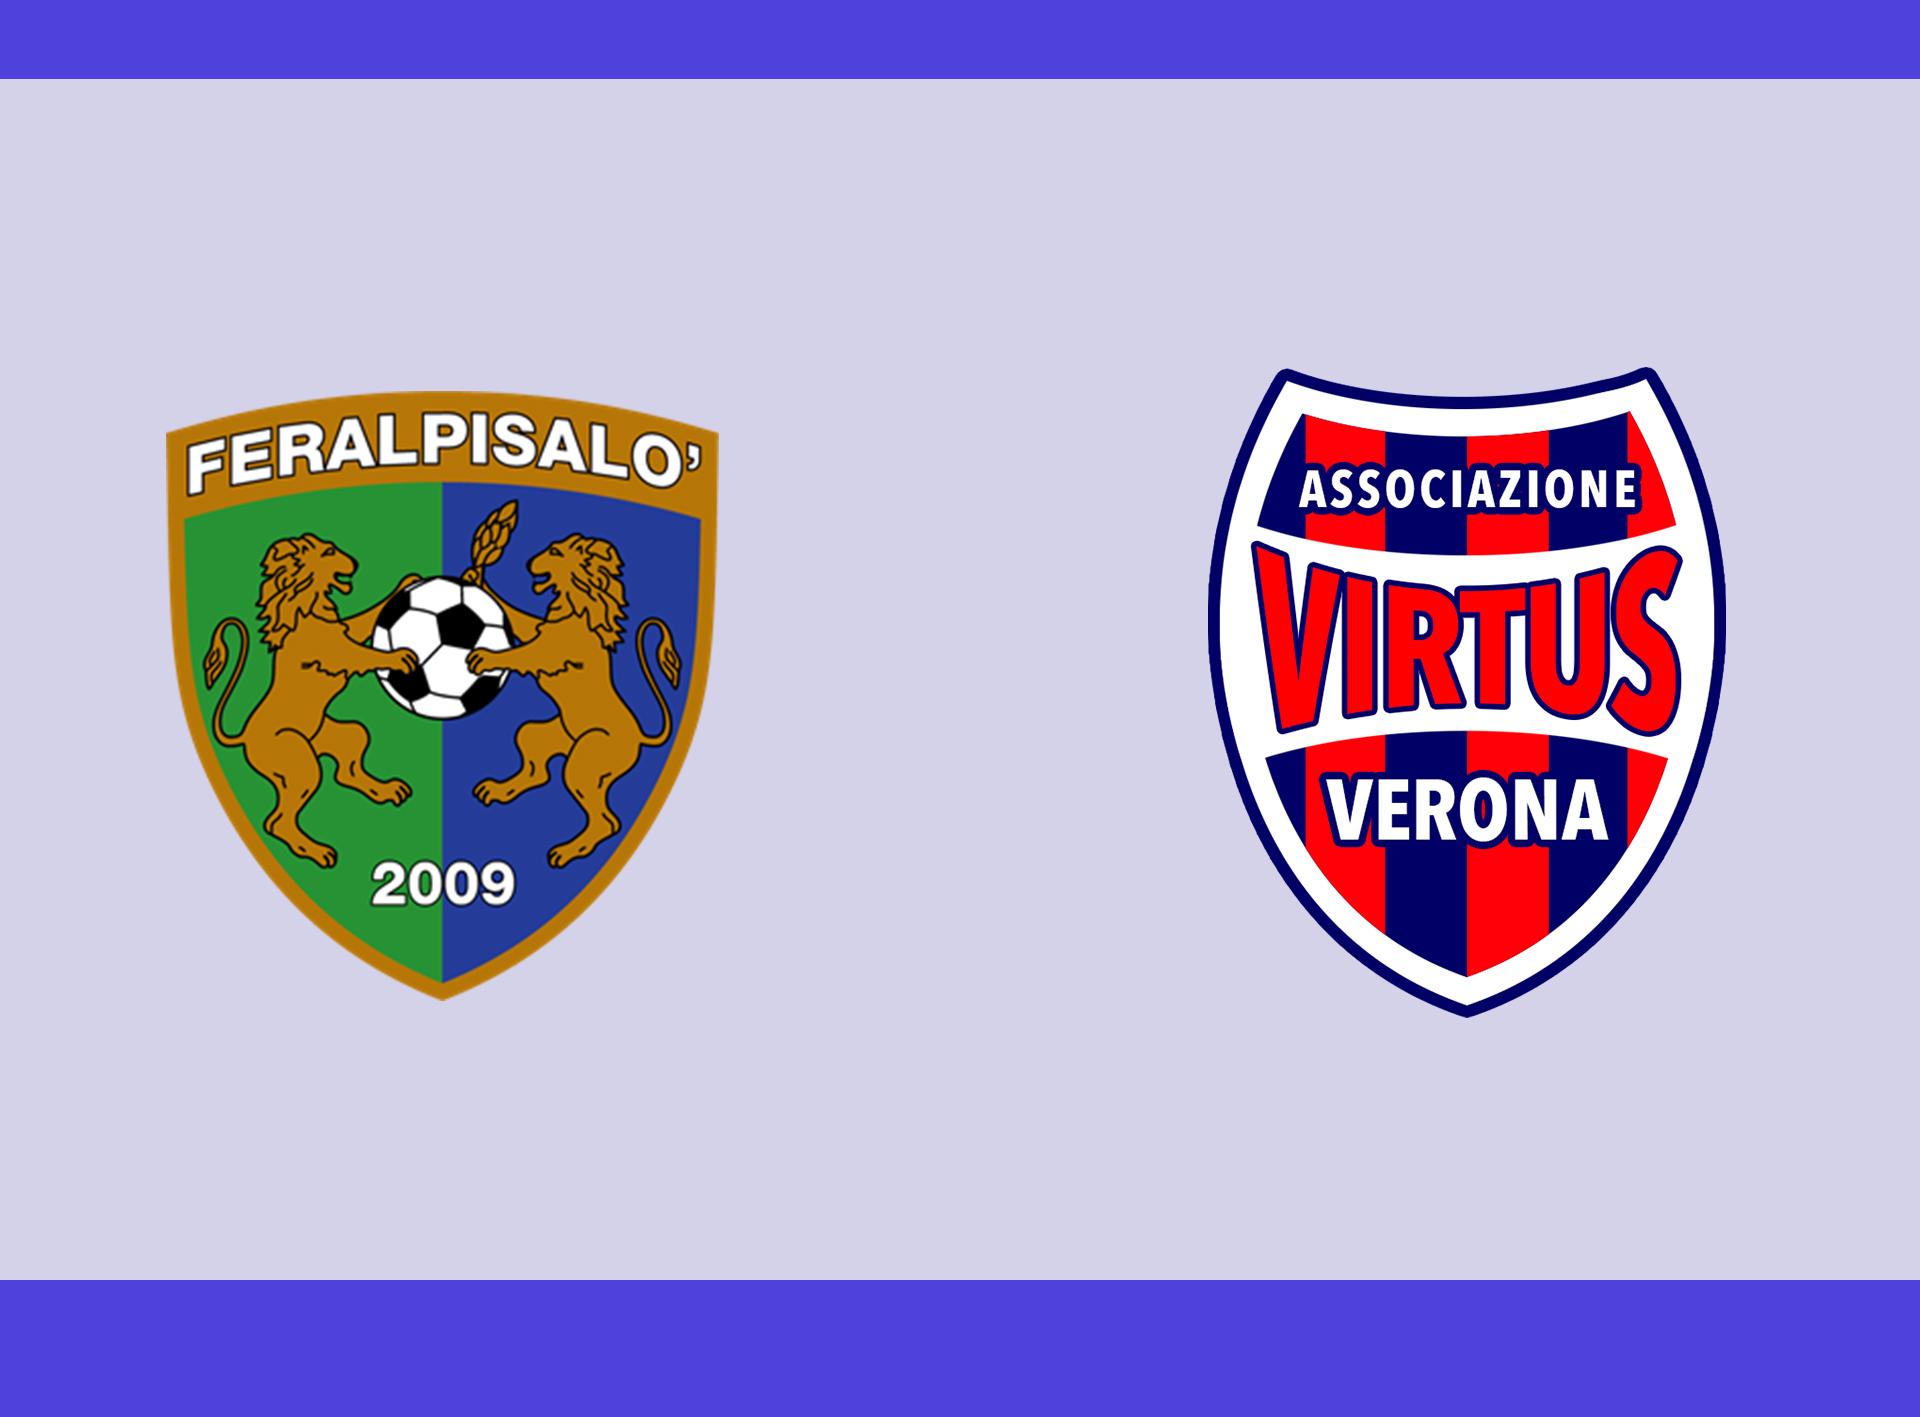 feralpisalo-vs-virtus-verona-tip-bong-da-11-10-2018 1